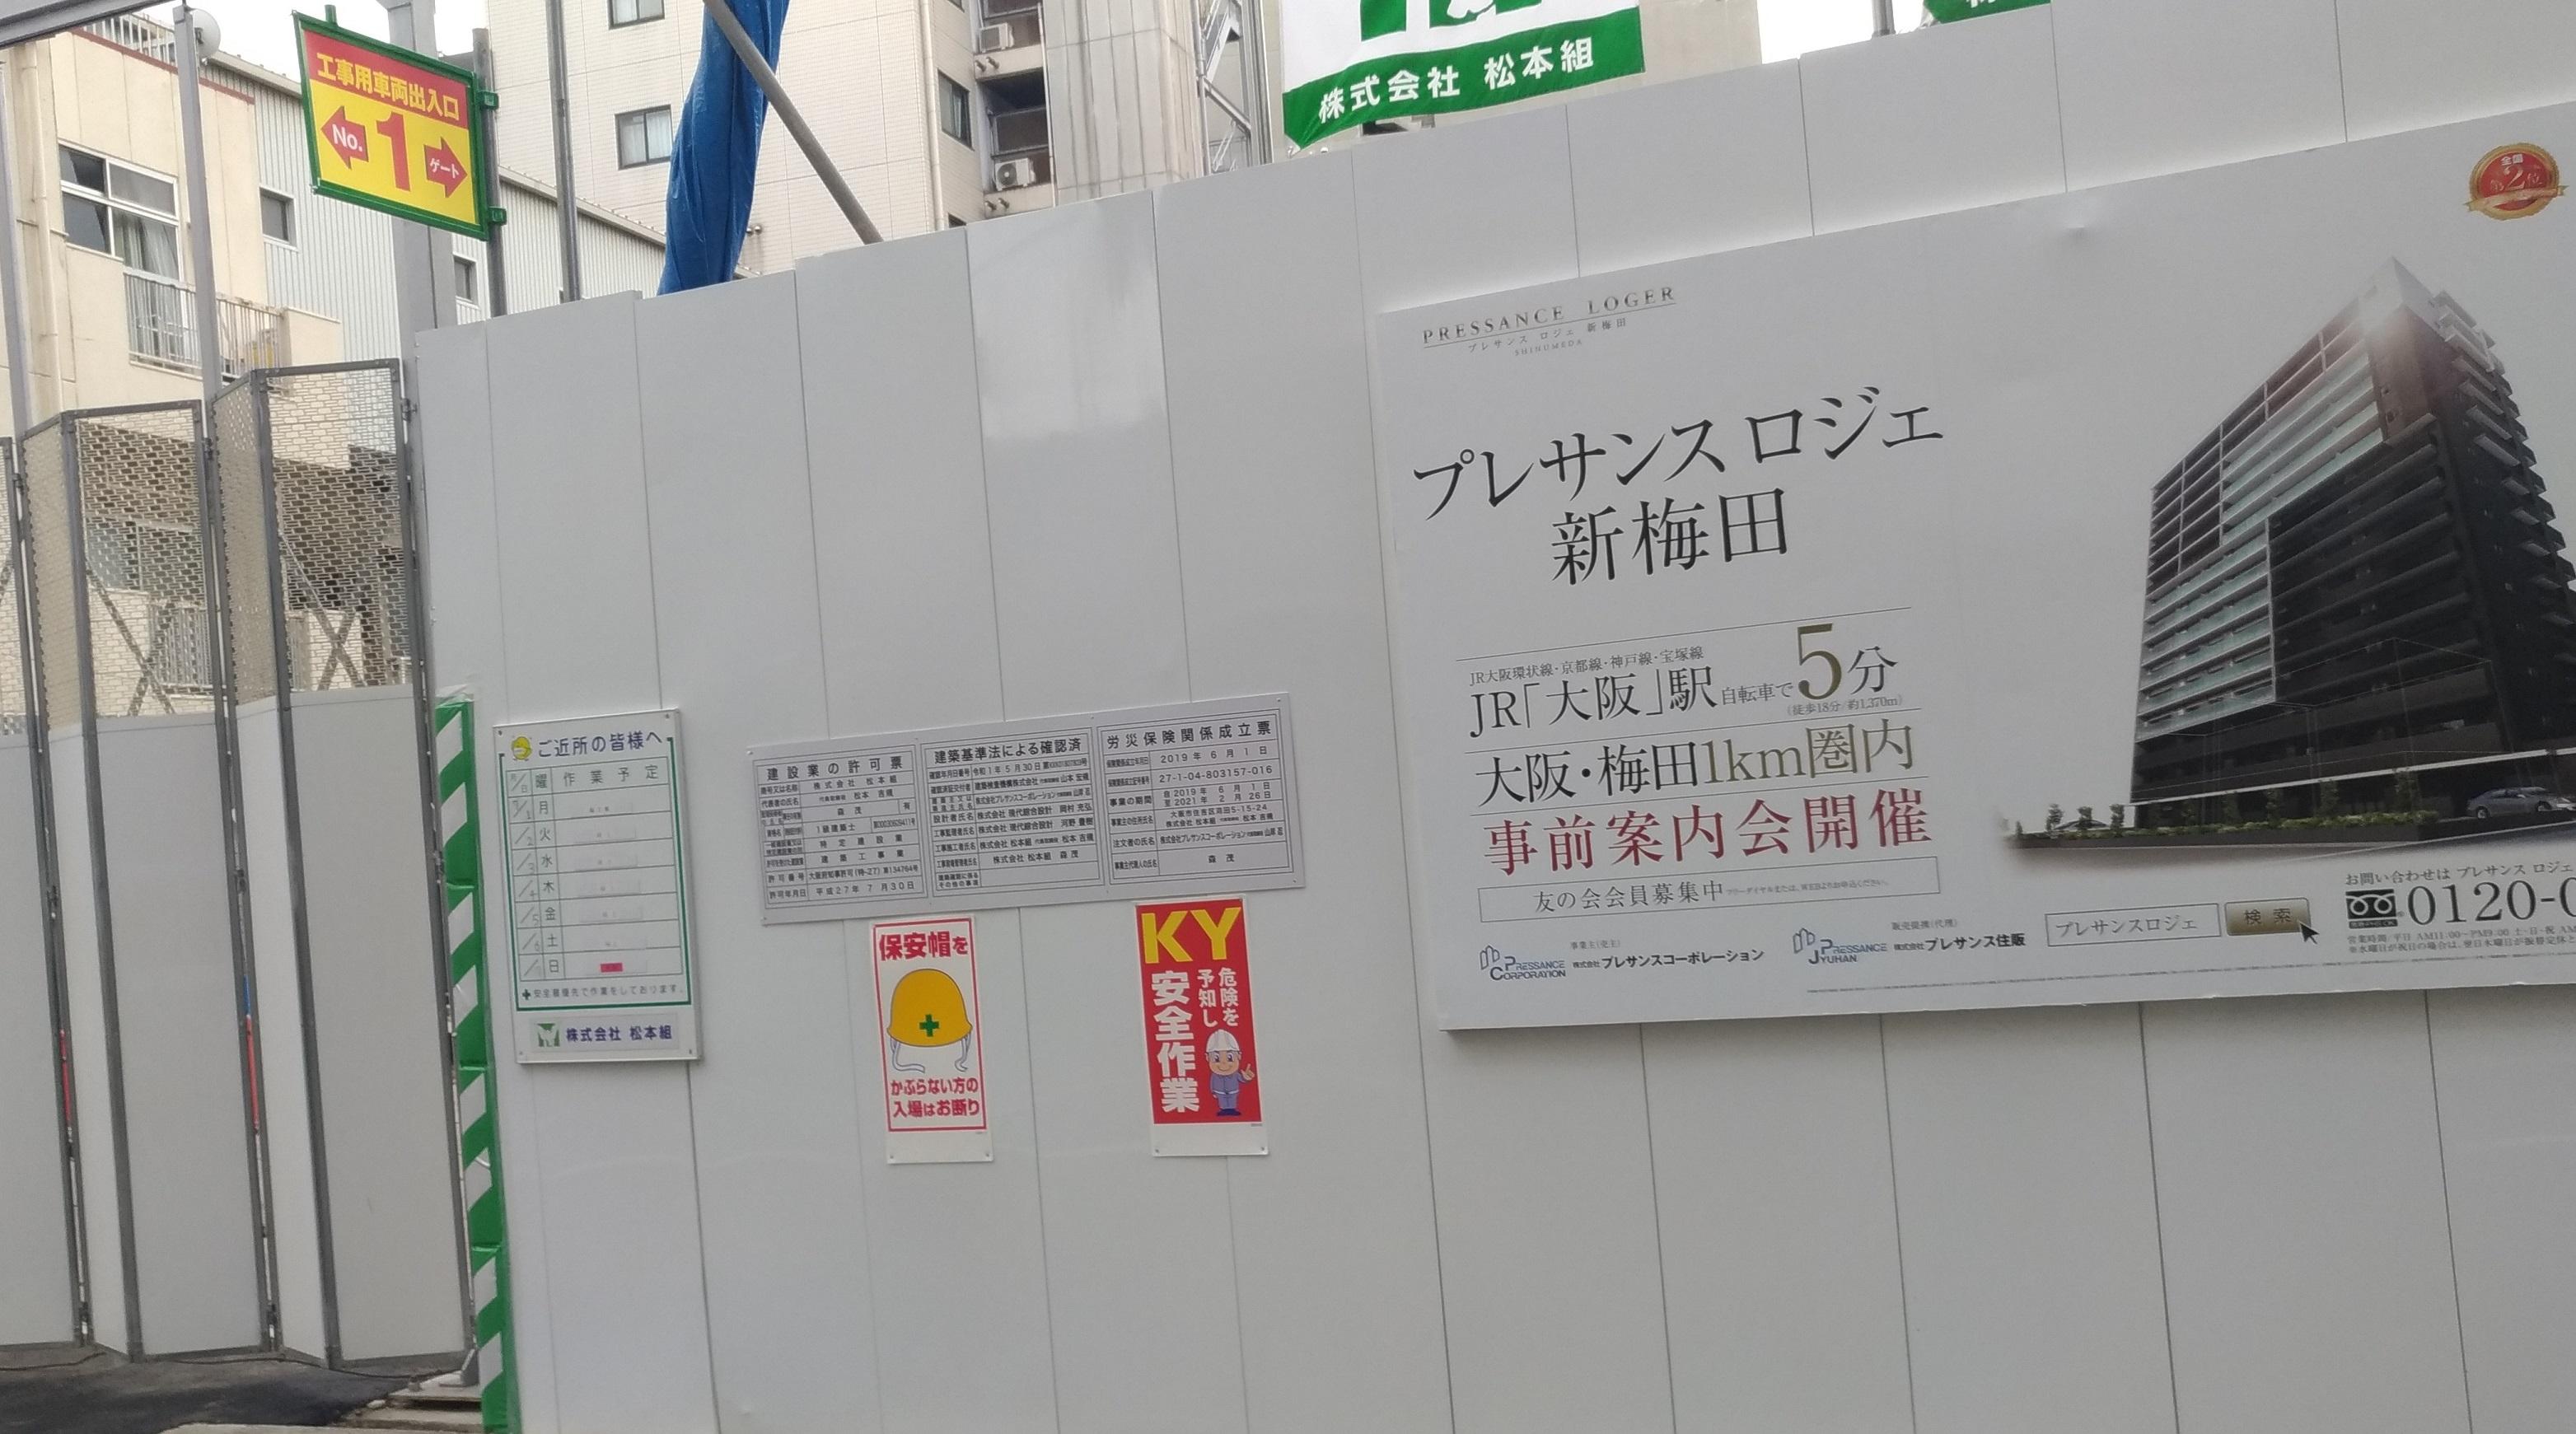 osaka_manshon_shinumeda_oyodo_2.jpg